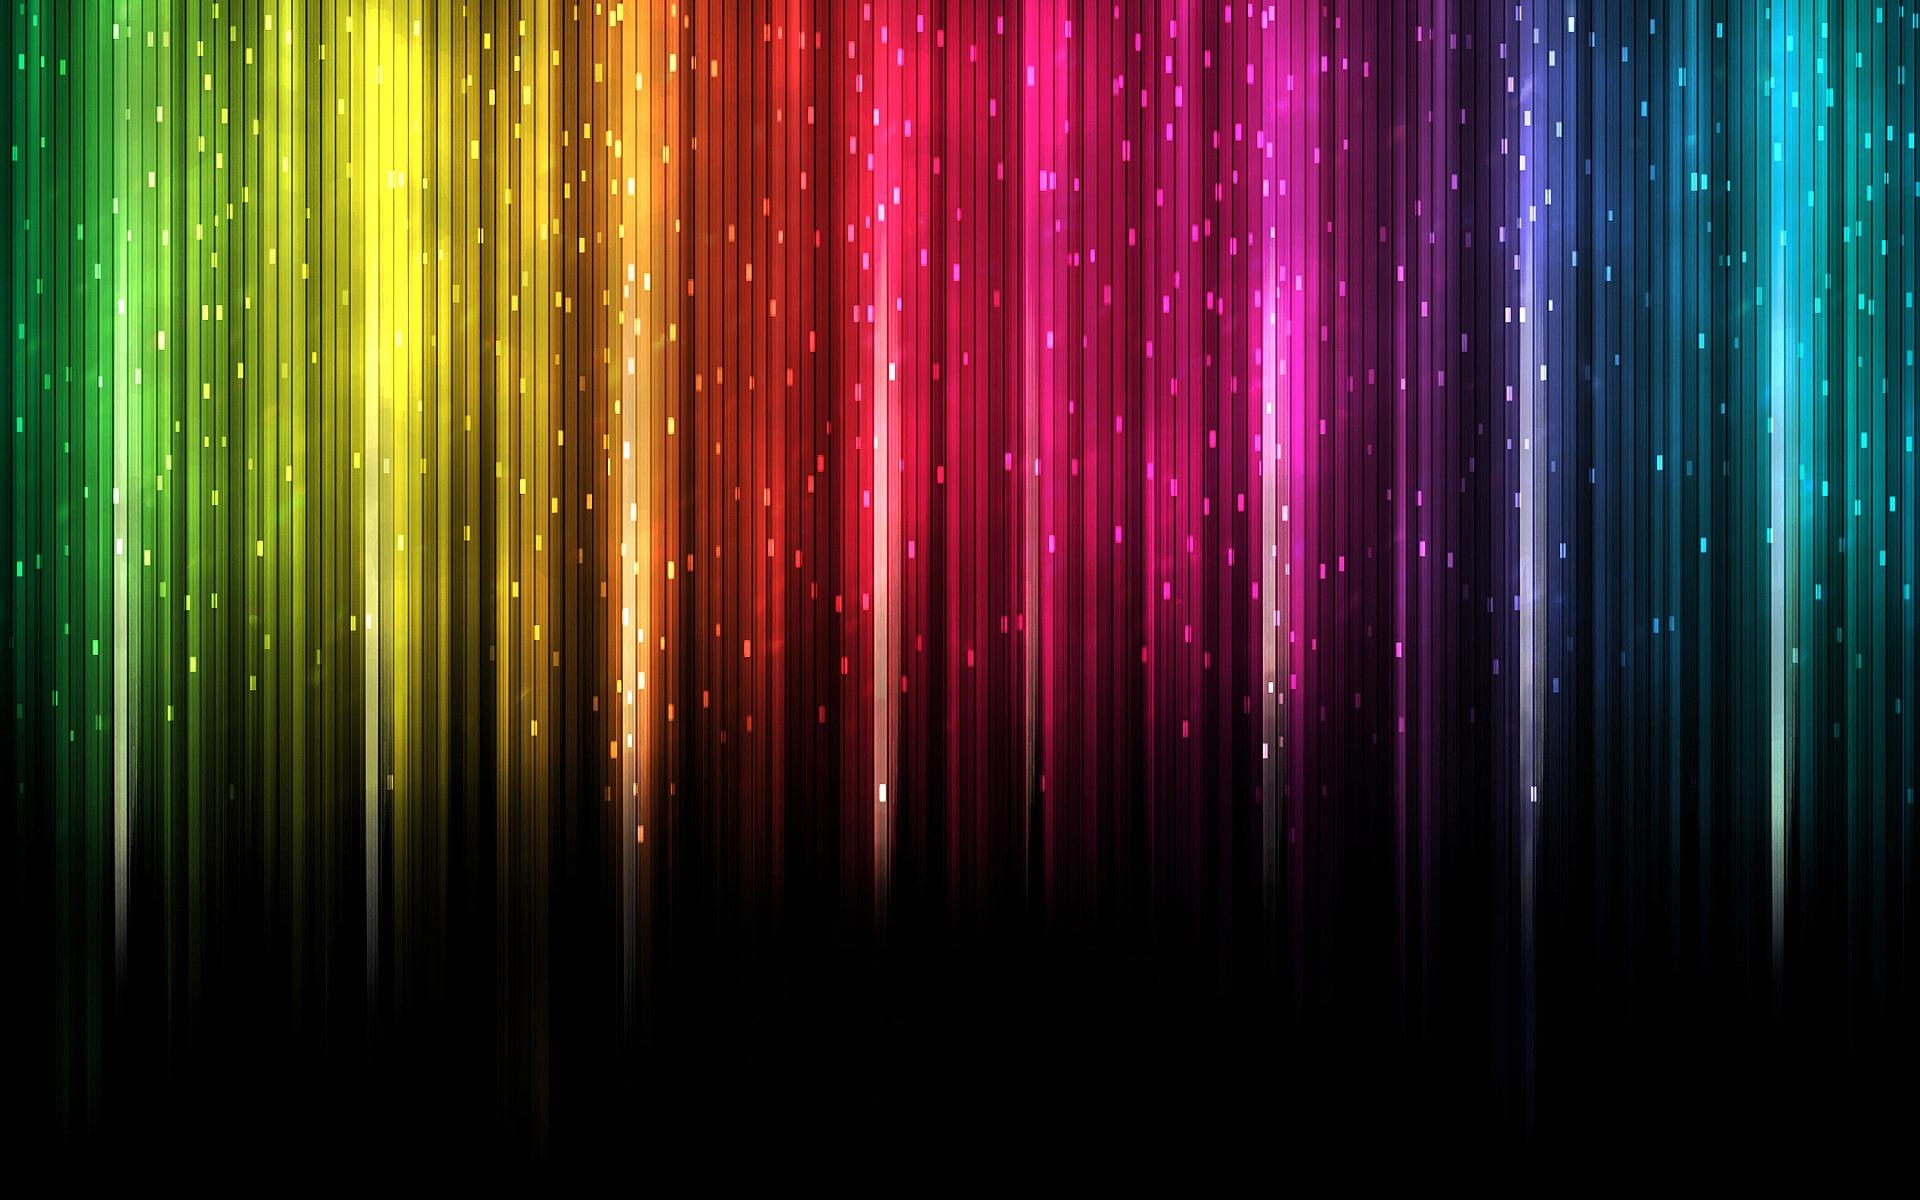 Bright colors wallpaper. Bright colors w.